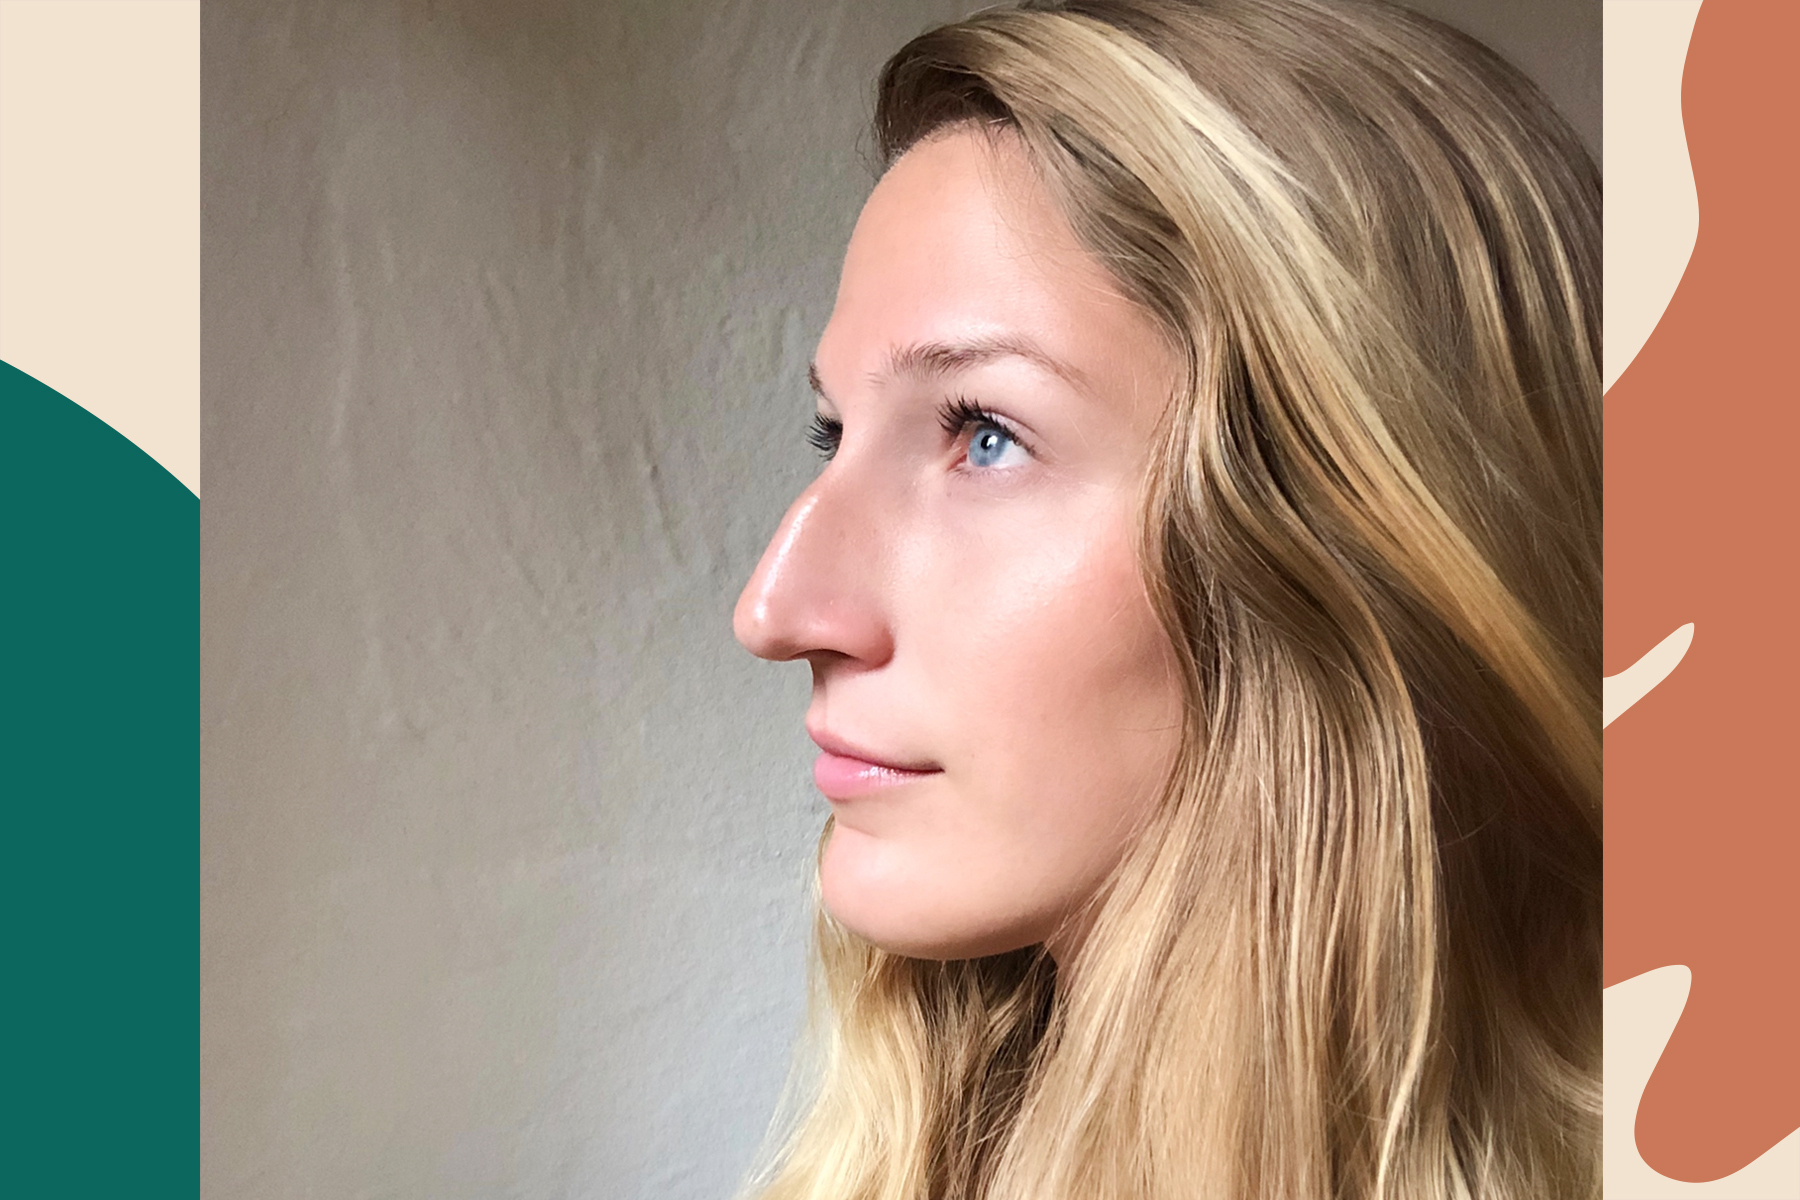 bumpy nose confidence